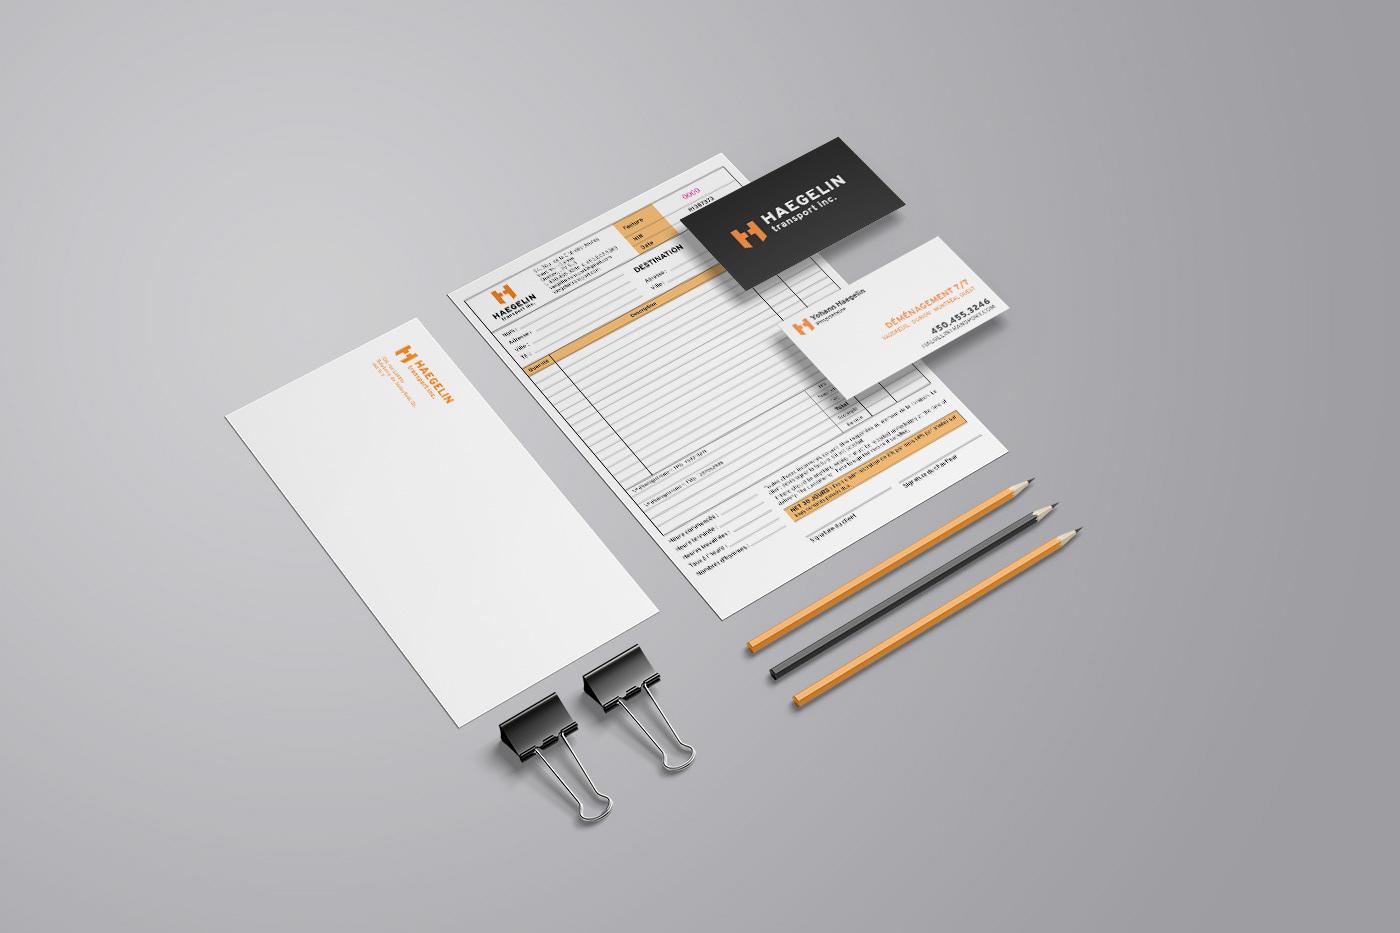 branding  design graphique graphic design  identité visuelle image corporative logo mark système identitaire visual identity